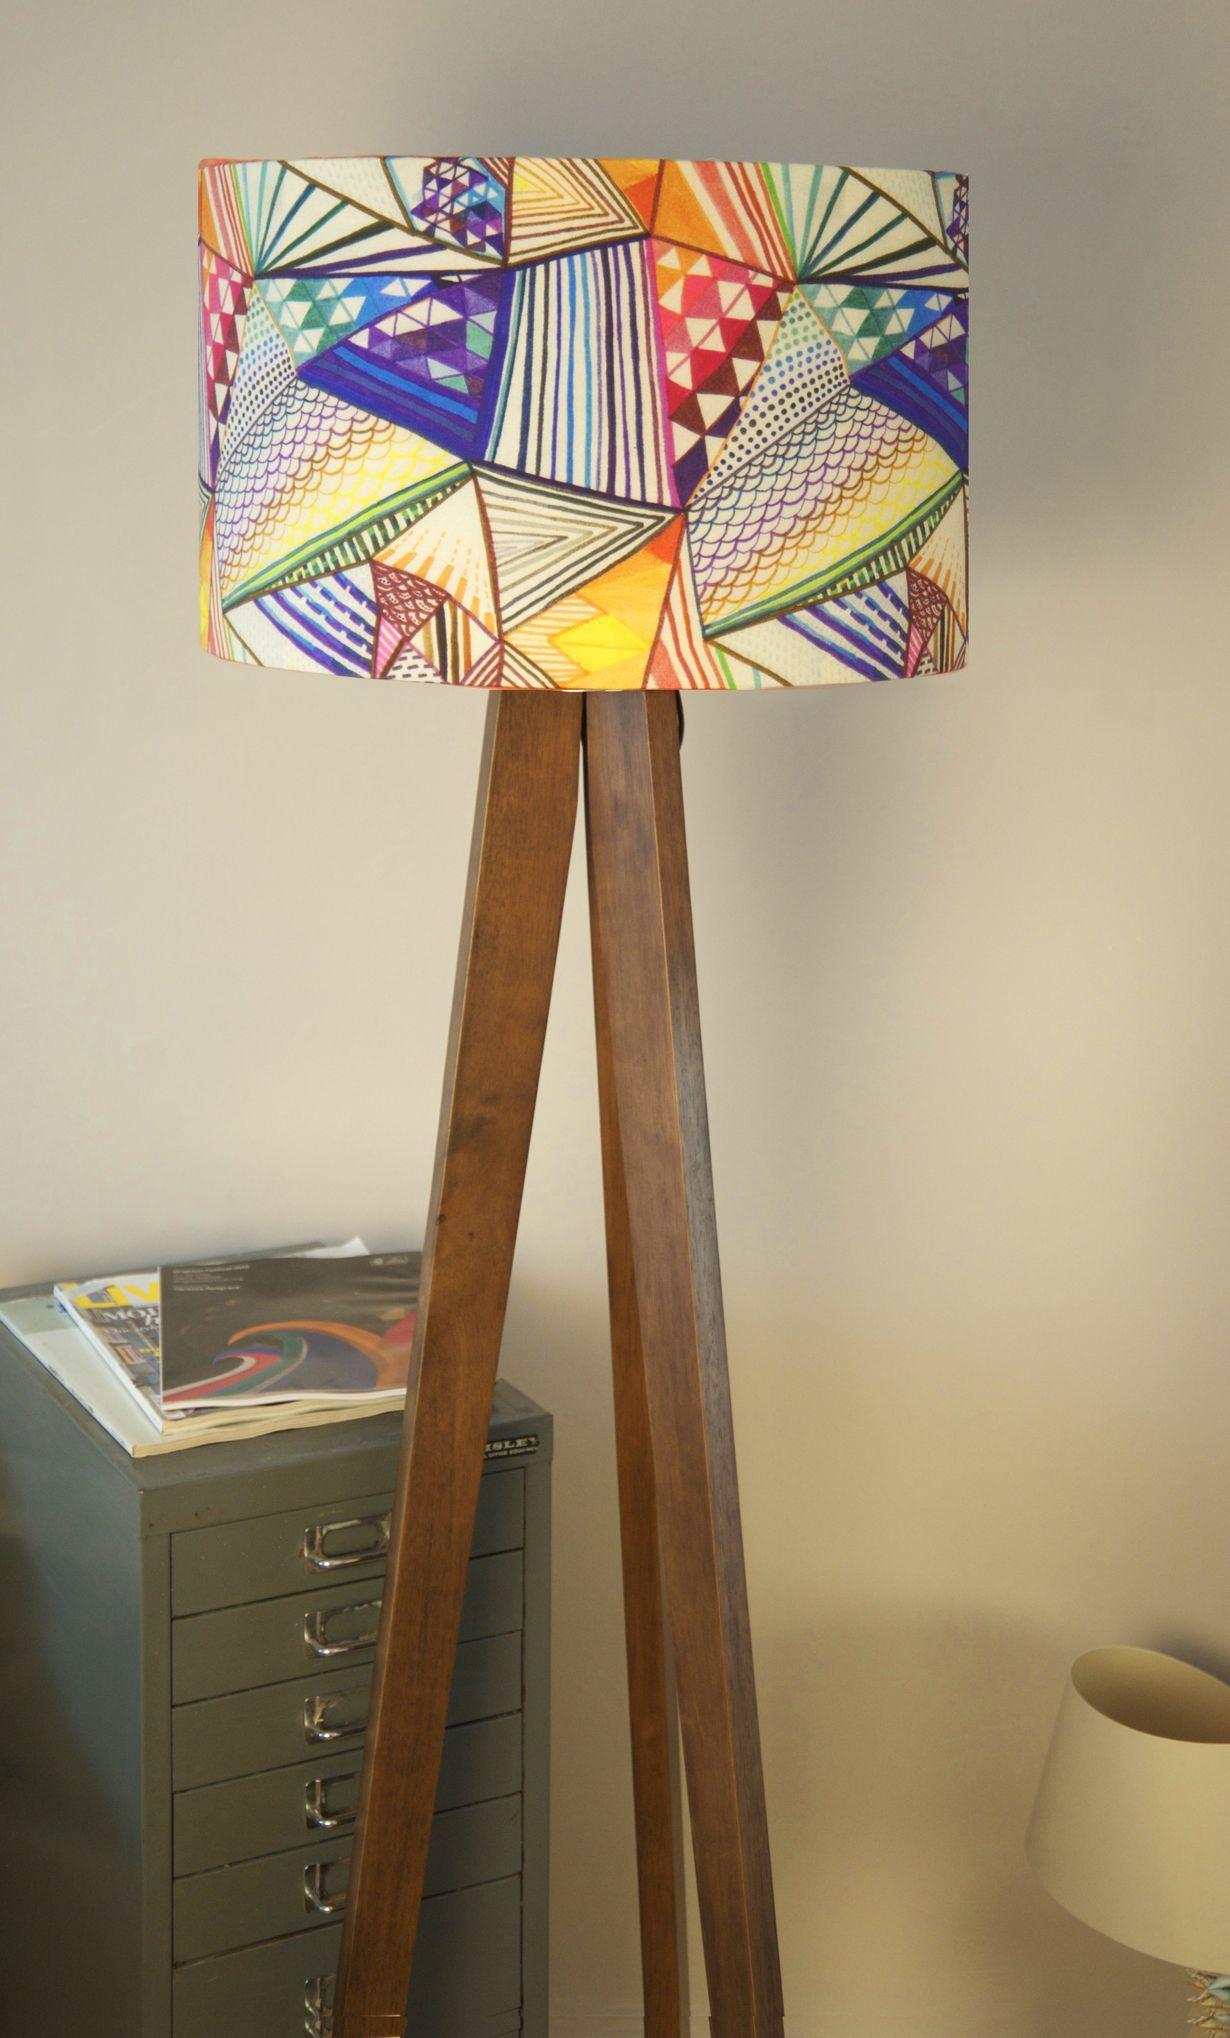 Ana montiel lampshade lampshade designs diy lamp shade